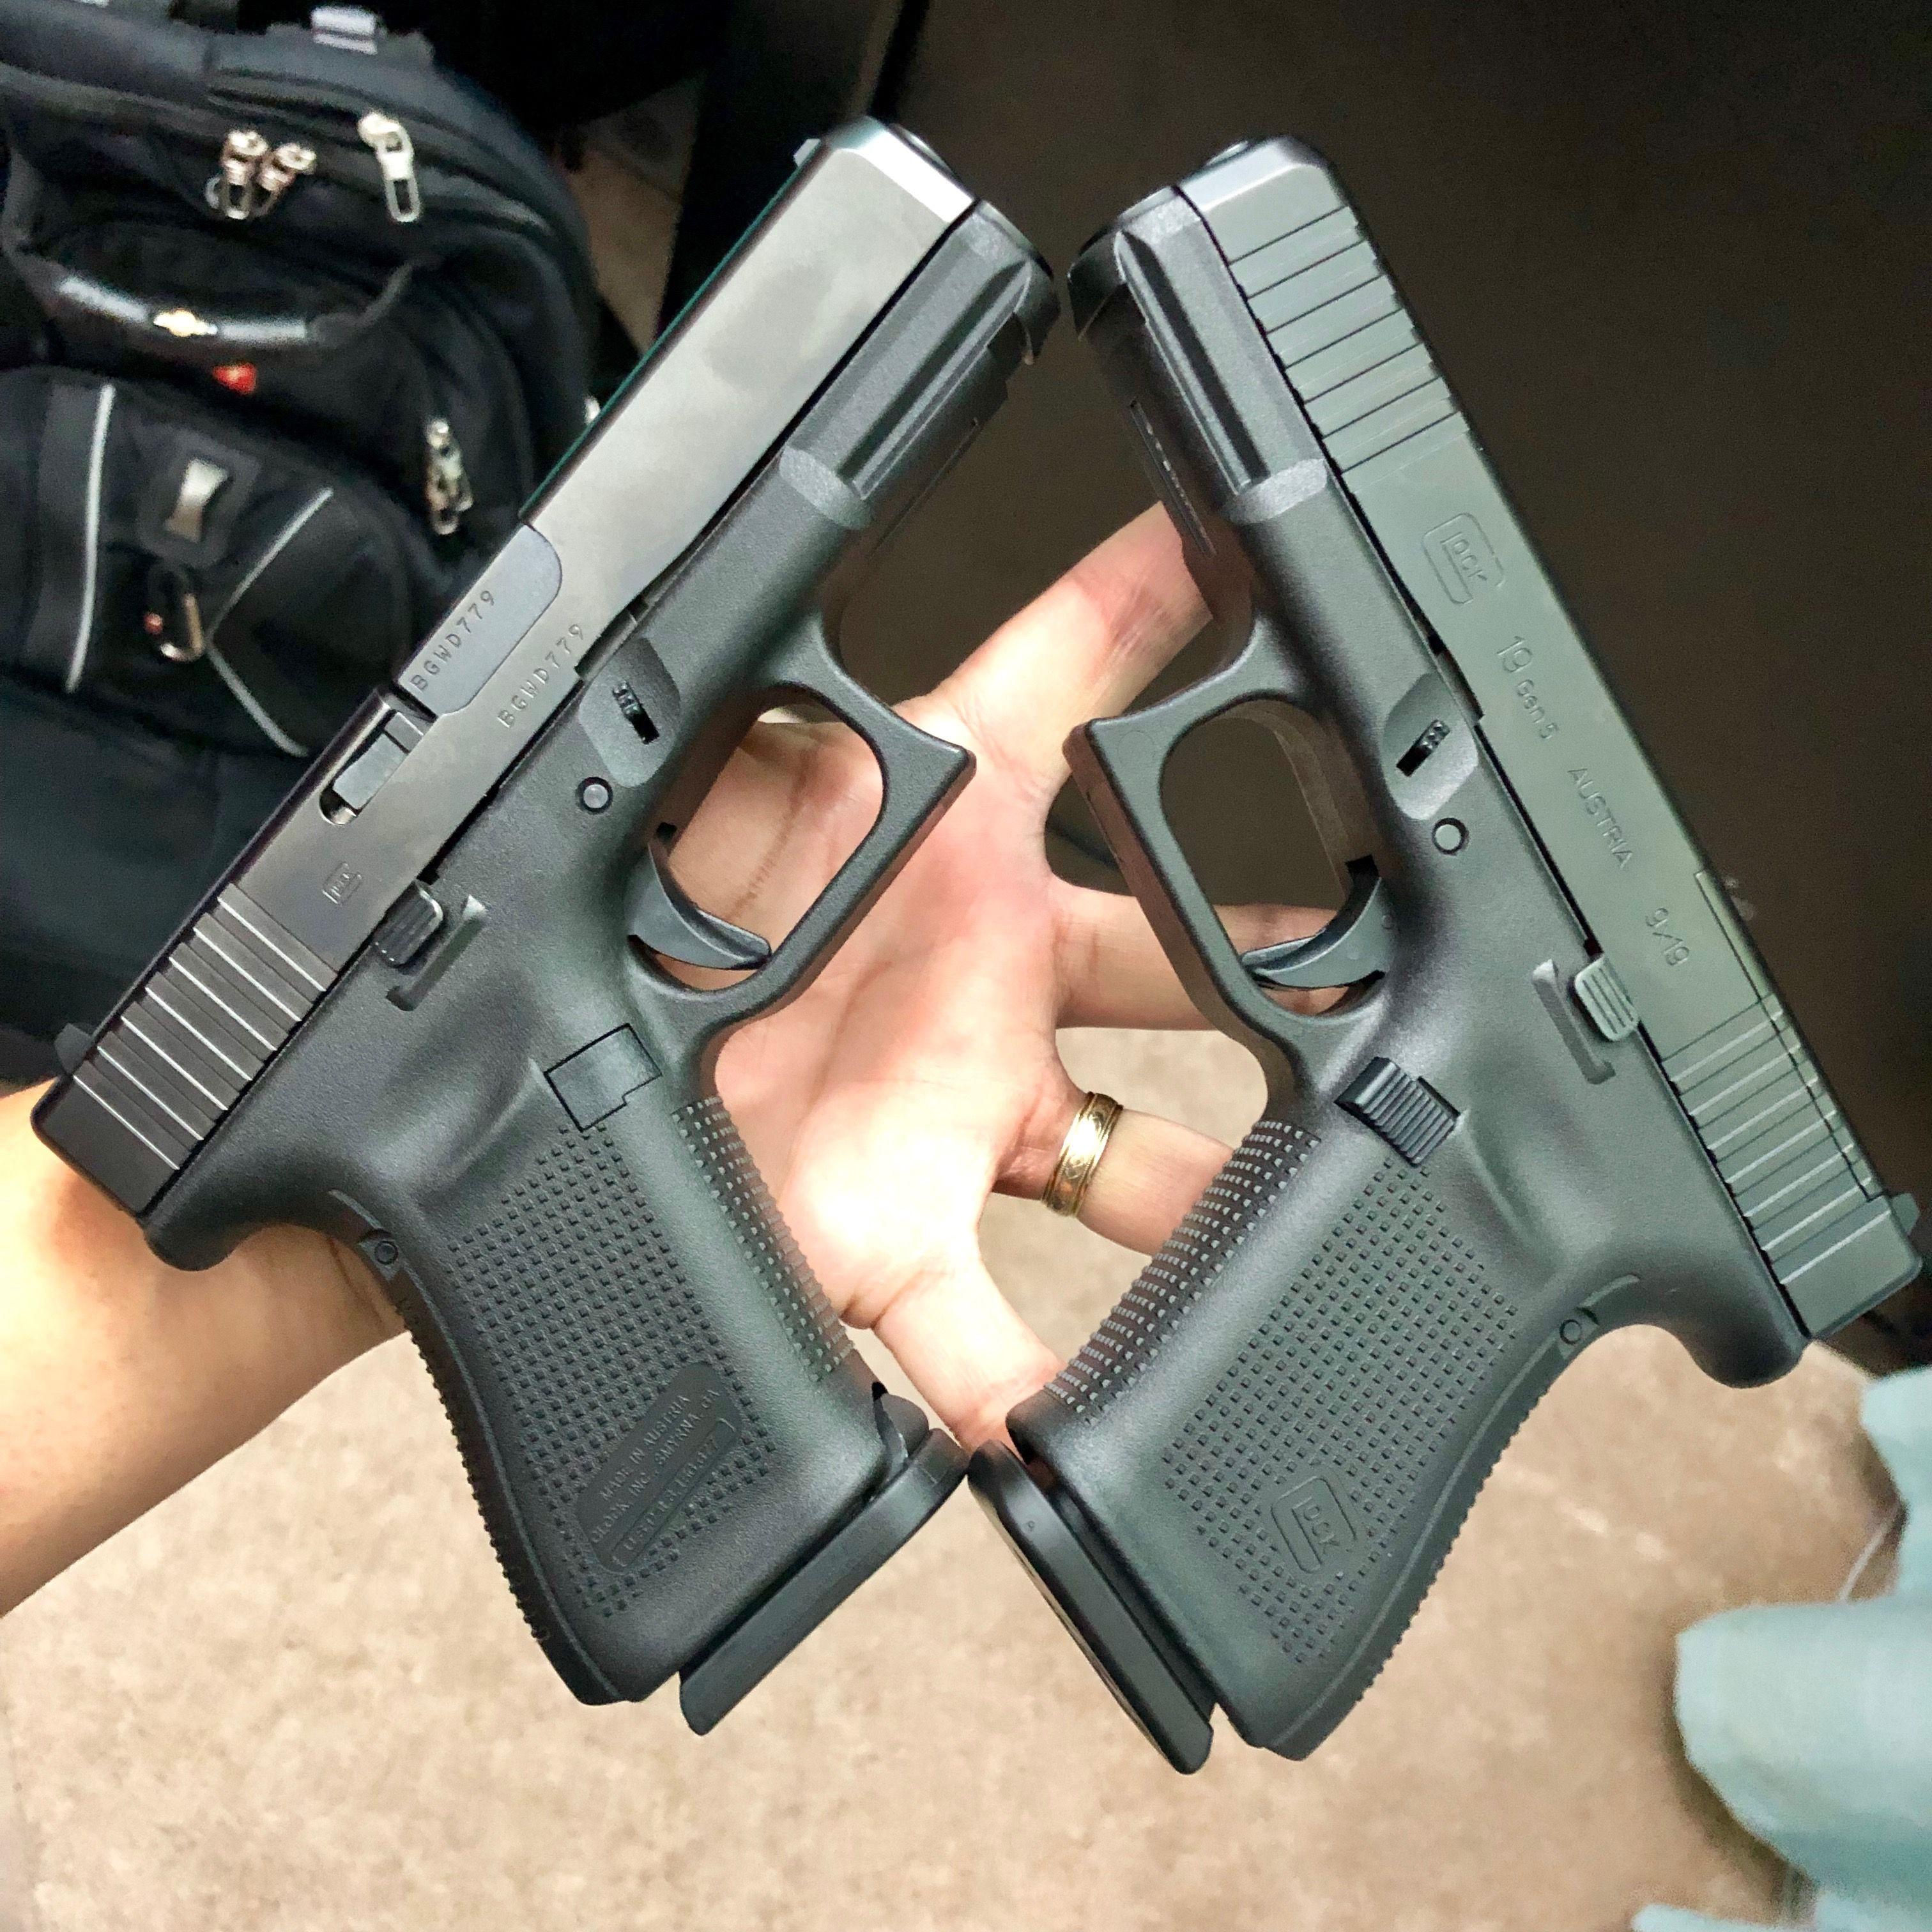 Glock 19 Gen 5 MOS and 1st release | Kuyajevs | Guns, Hand guns